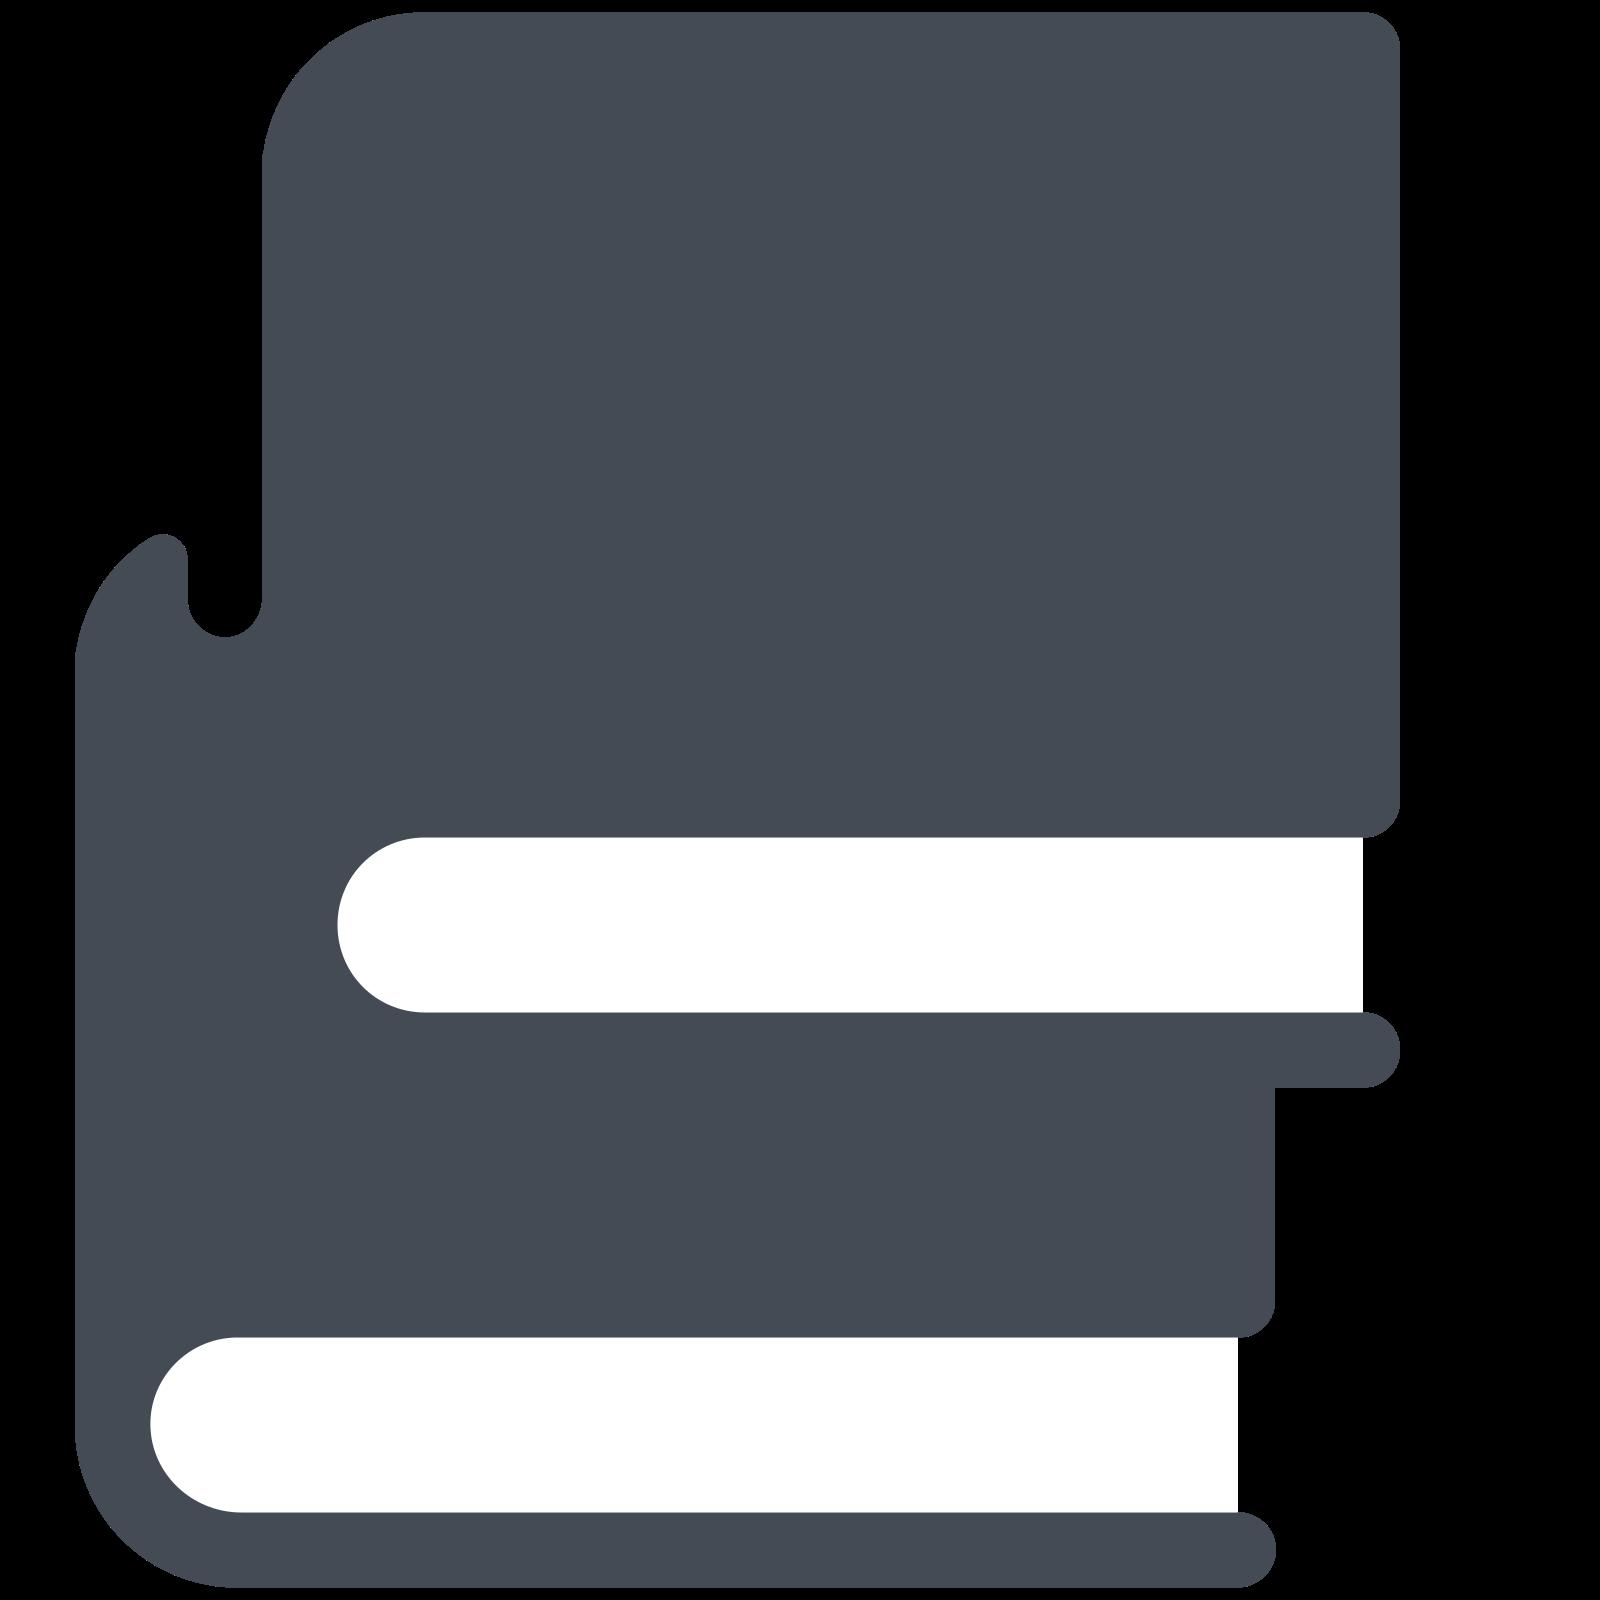 Książki icon